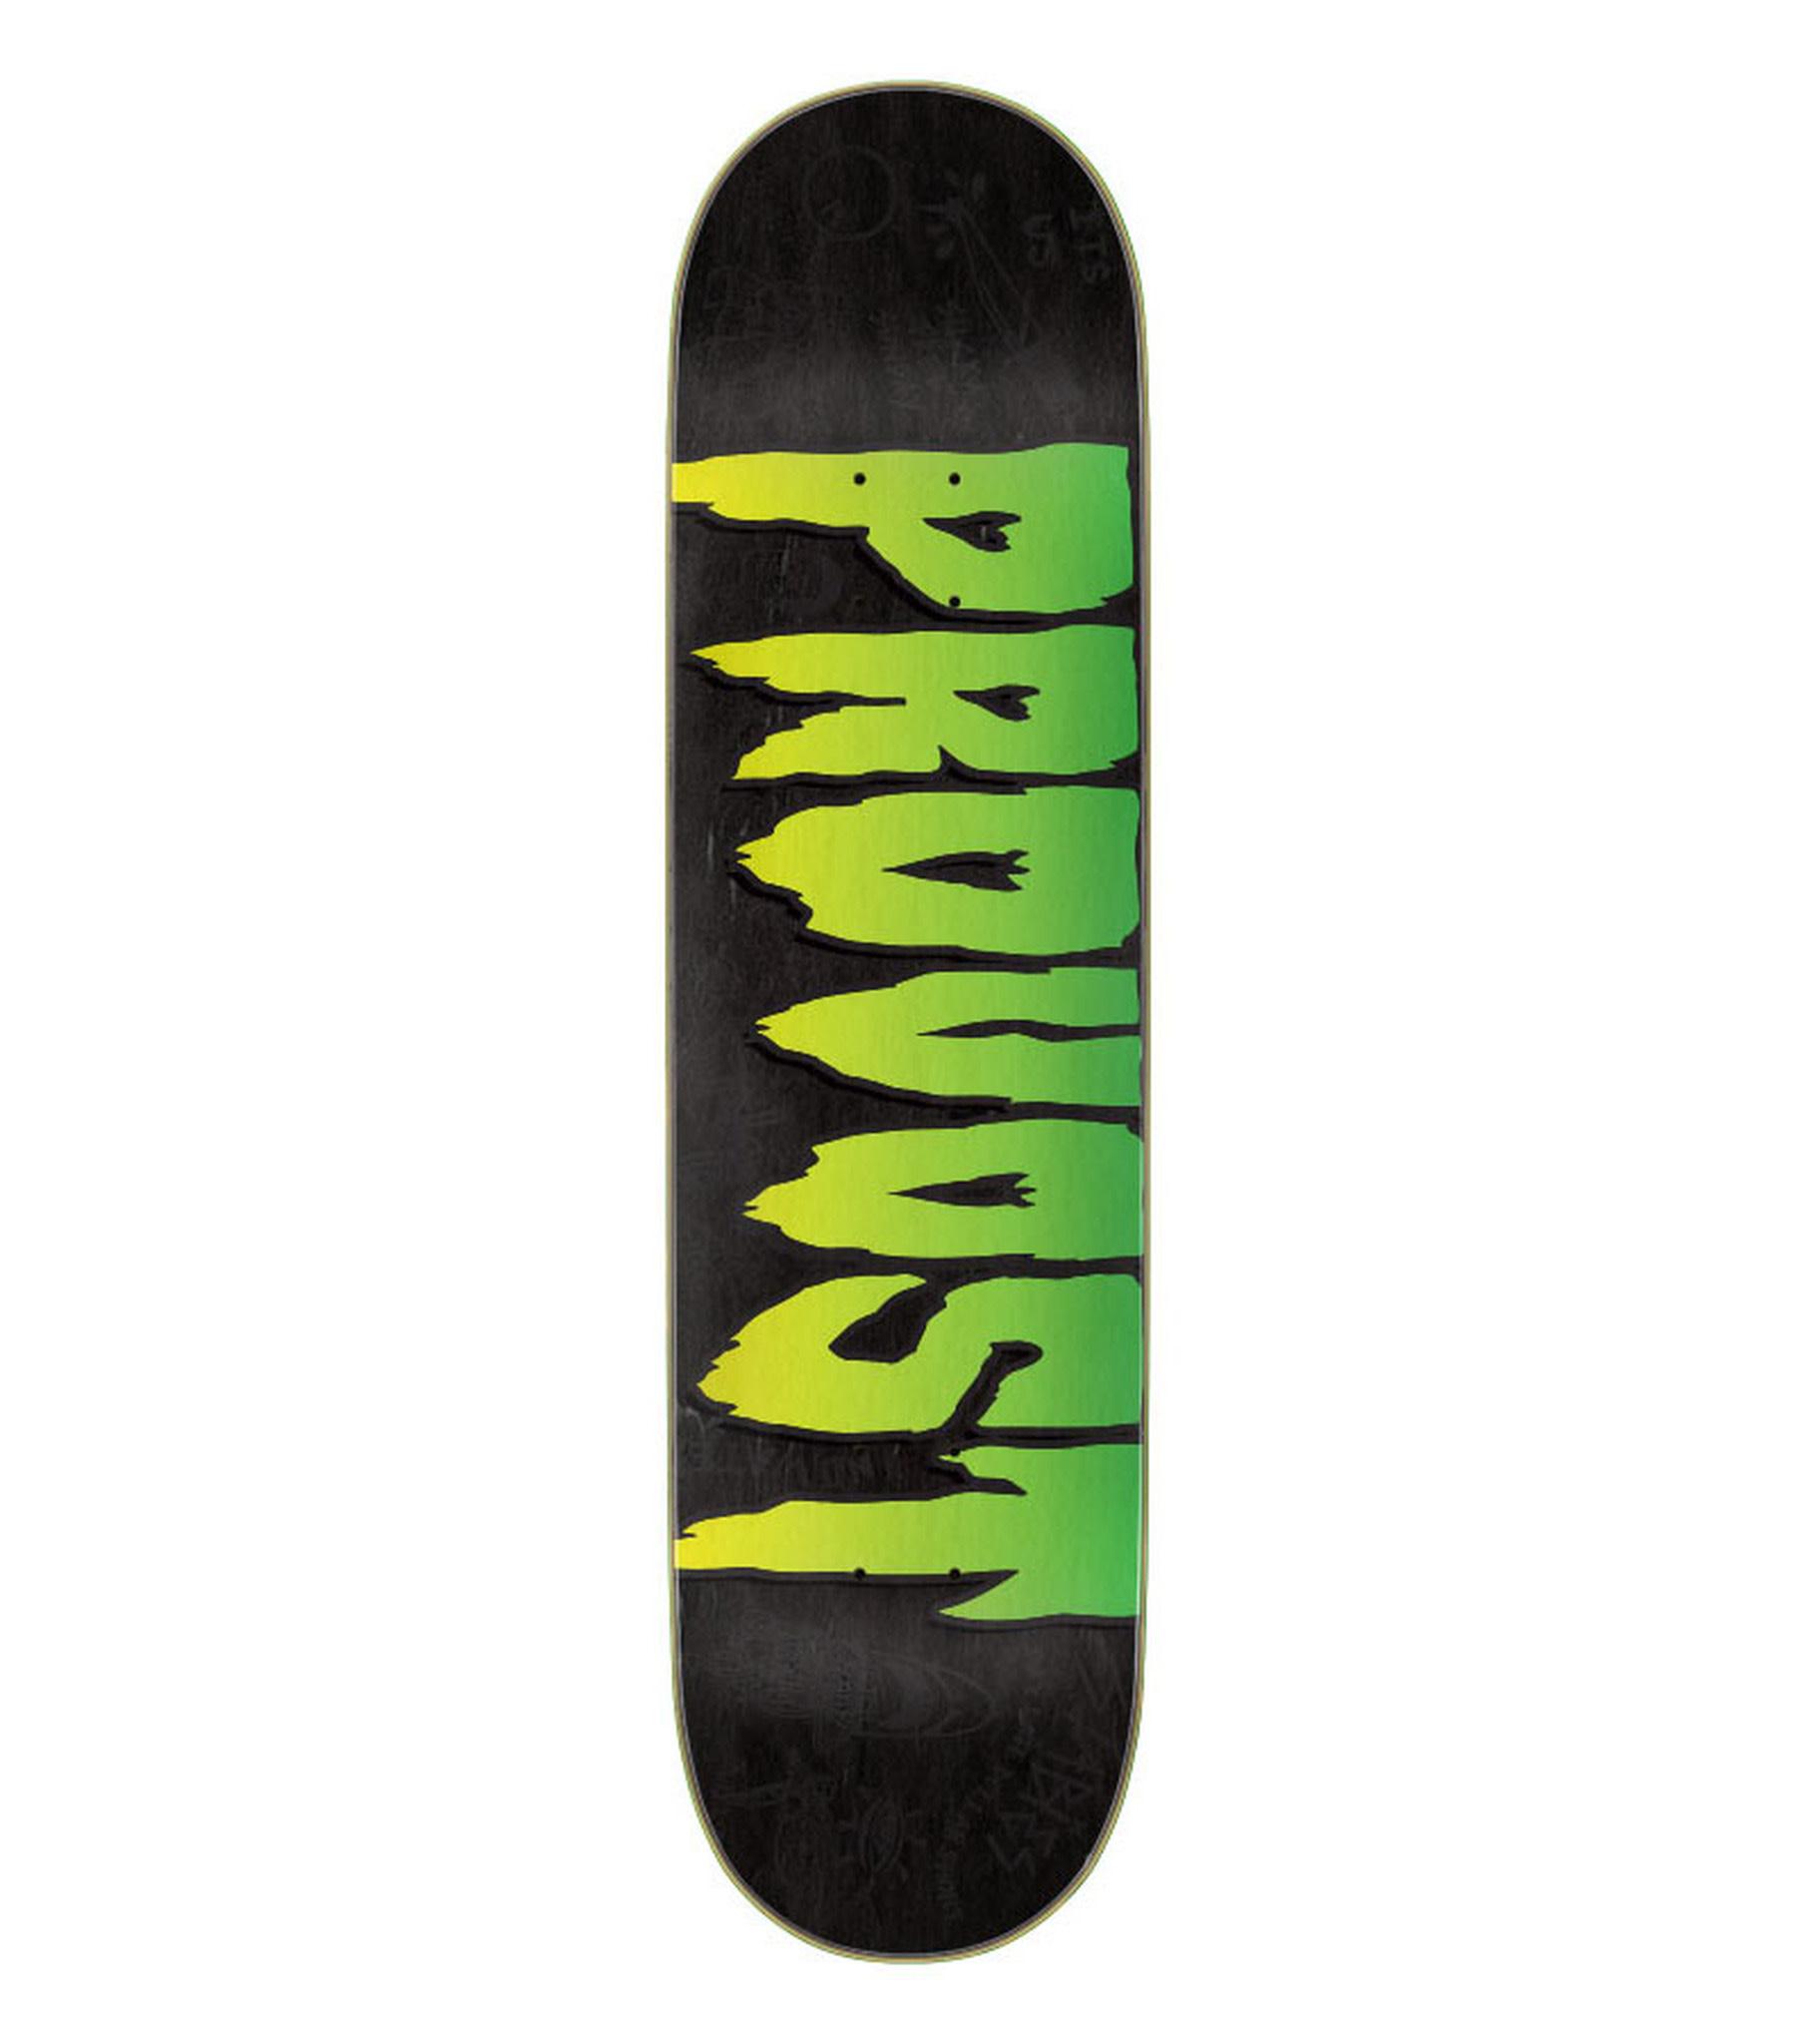 Creature Skateboards Provost Pro Logo 8.0